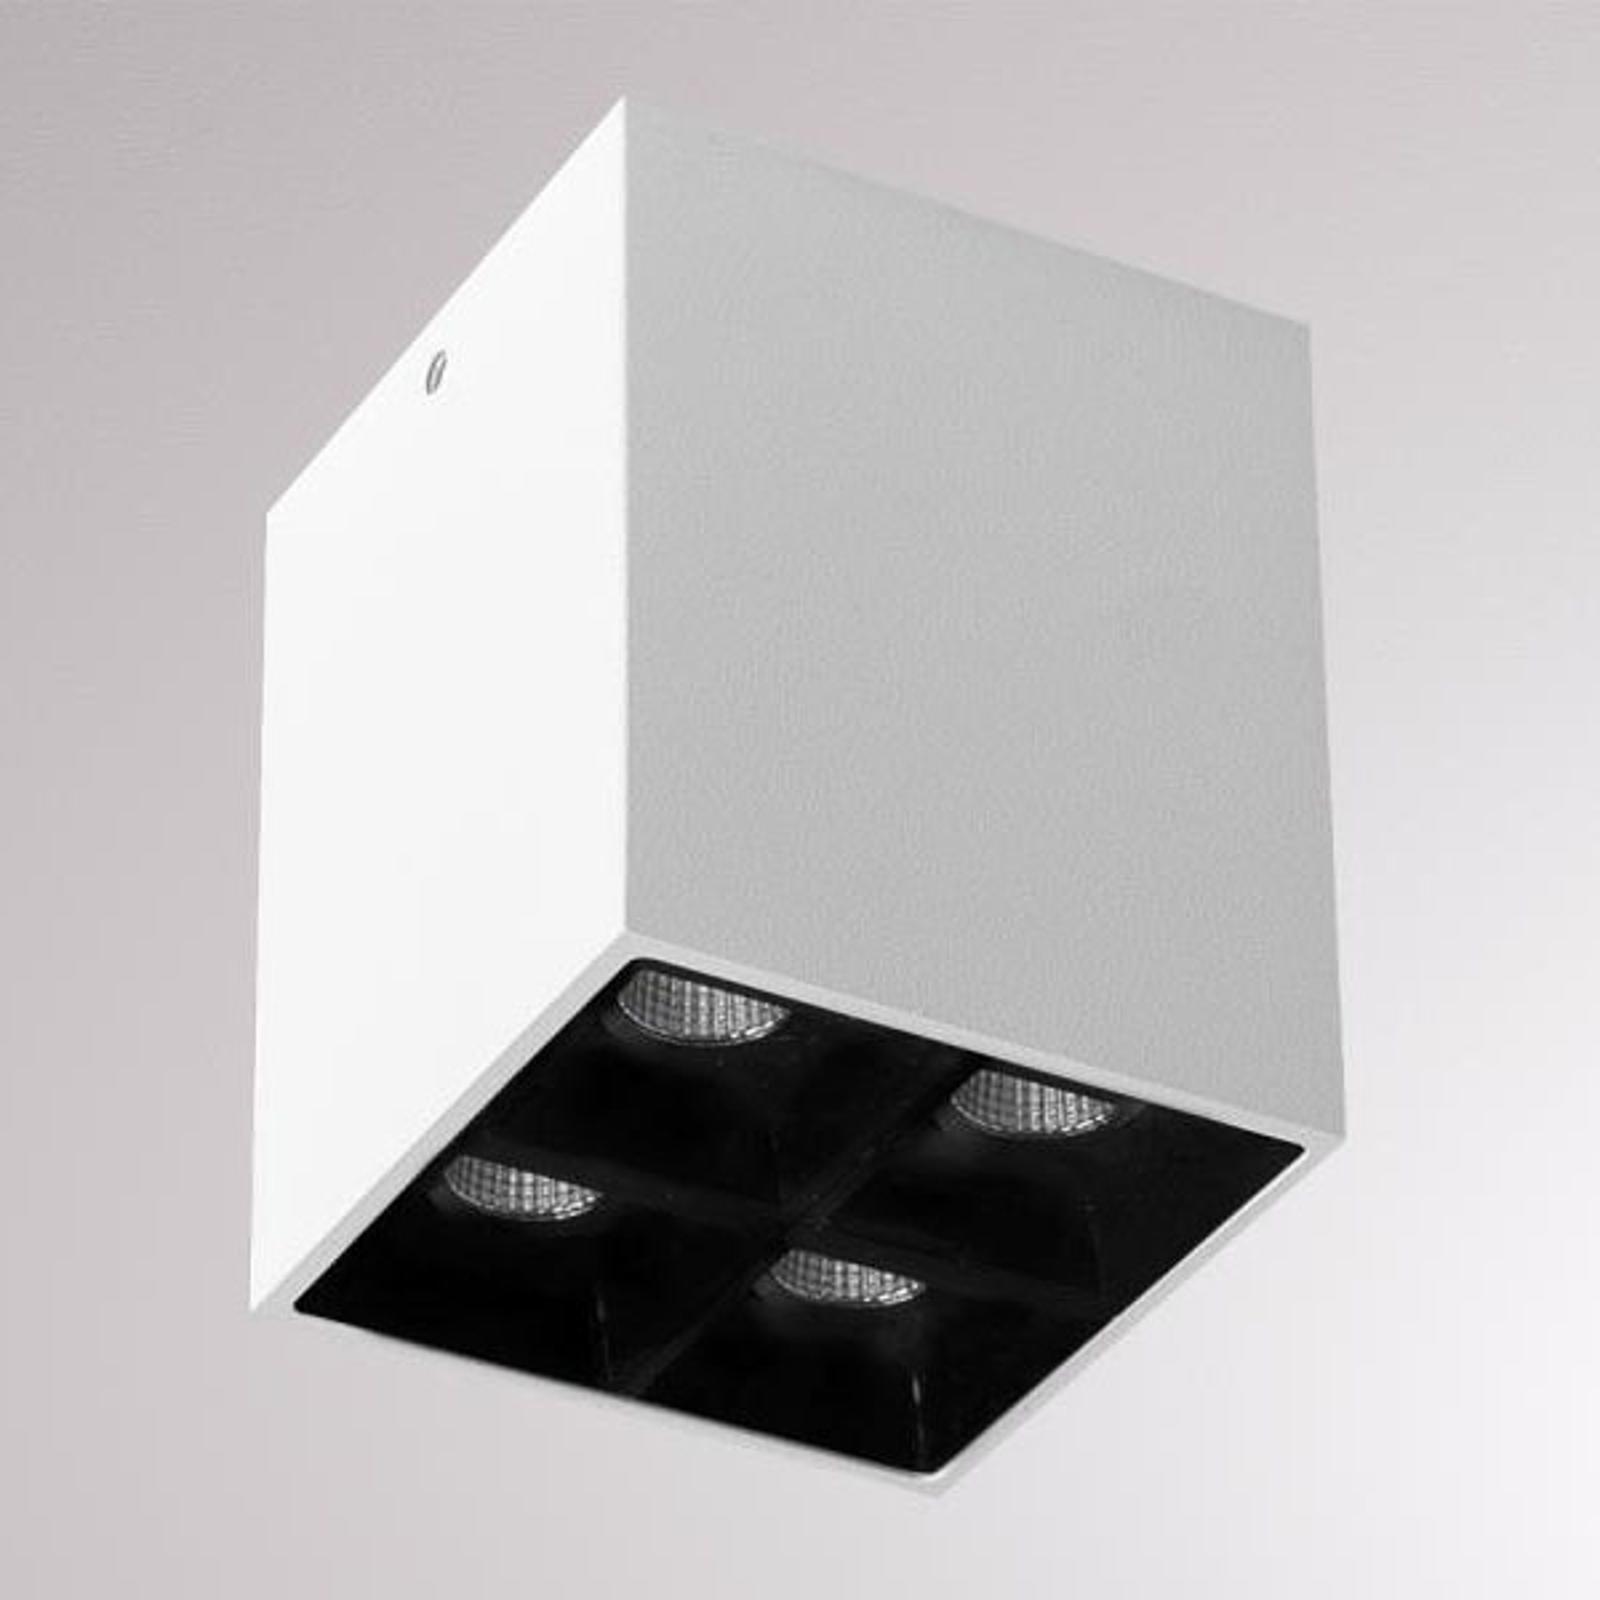 LOUM Liro LED-Deckenspot weiß/schwarz 34° 3.000K